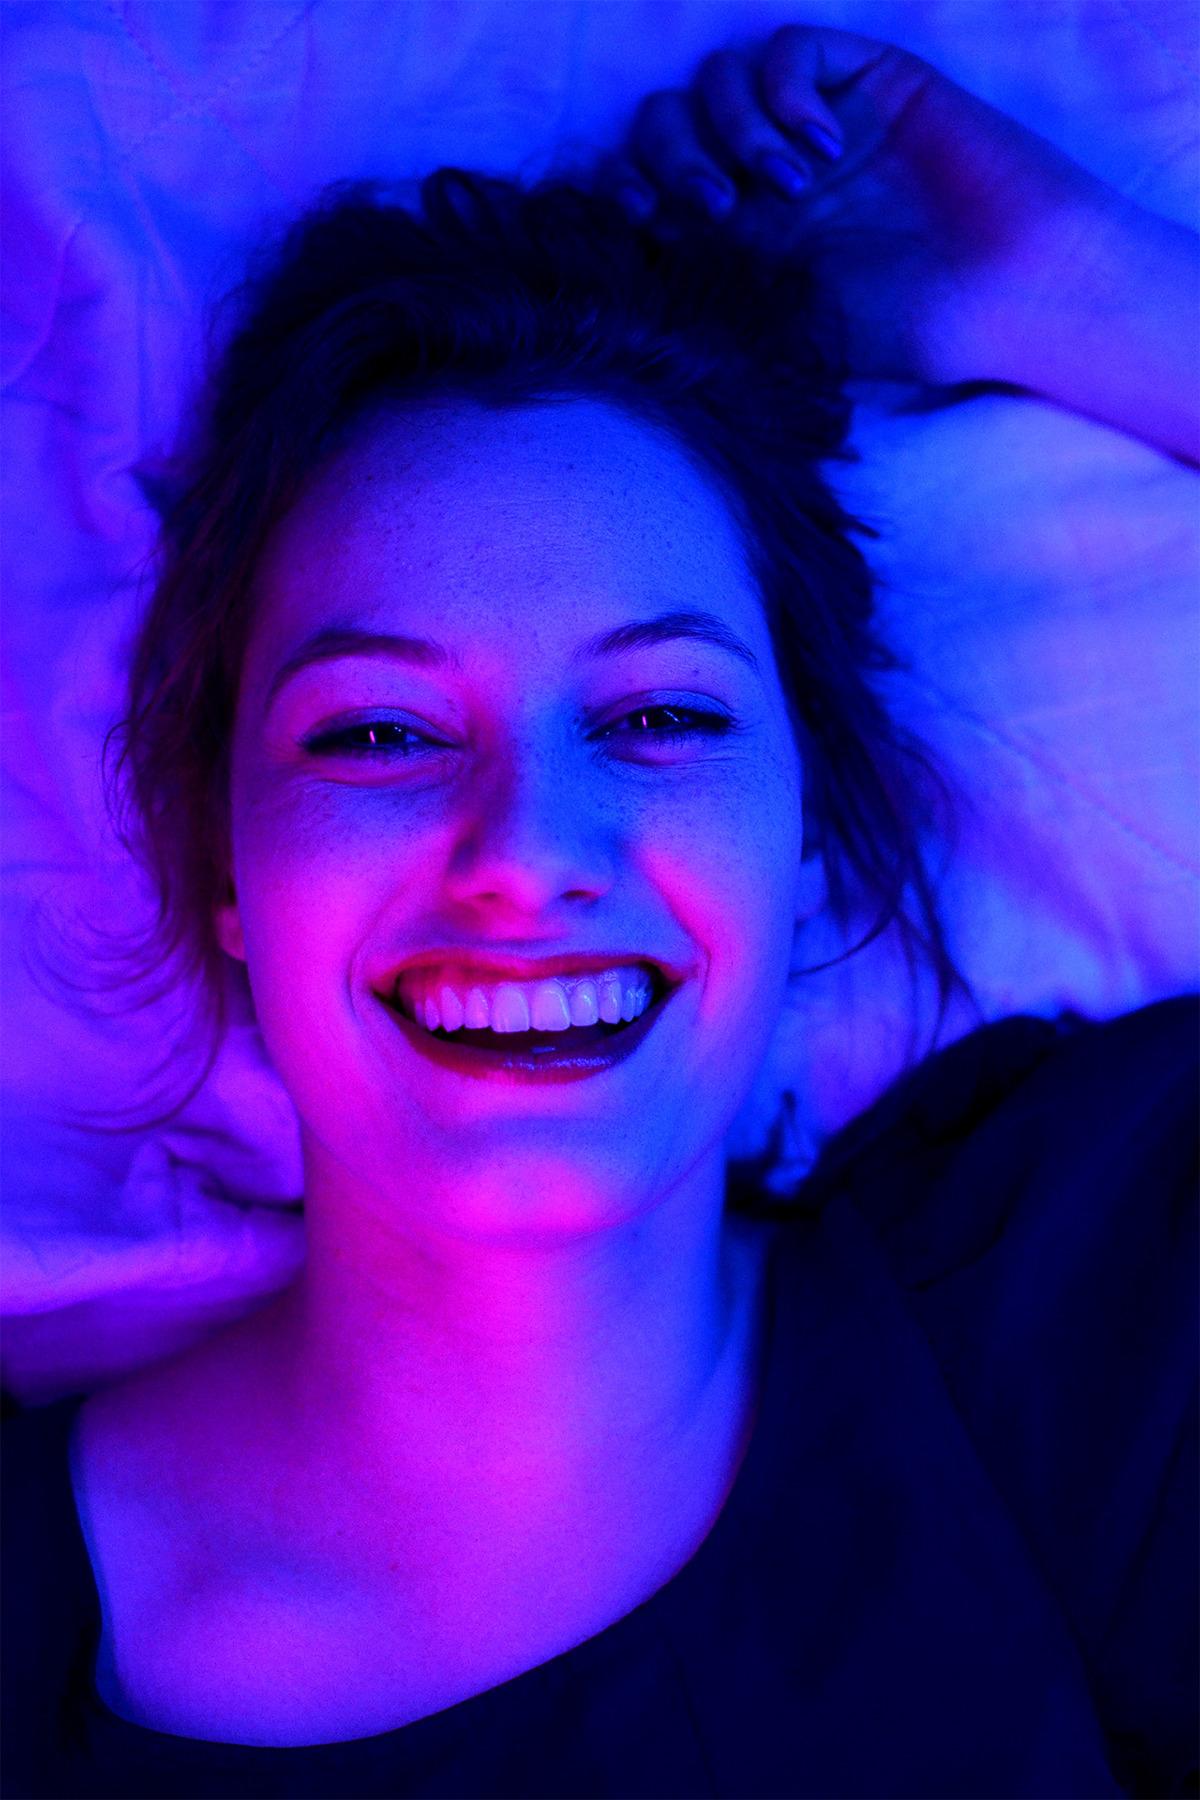 Neon Light Portrait On Behance: Neon Lights On Behance